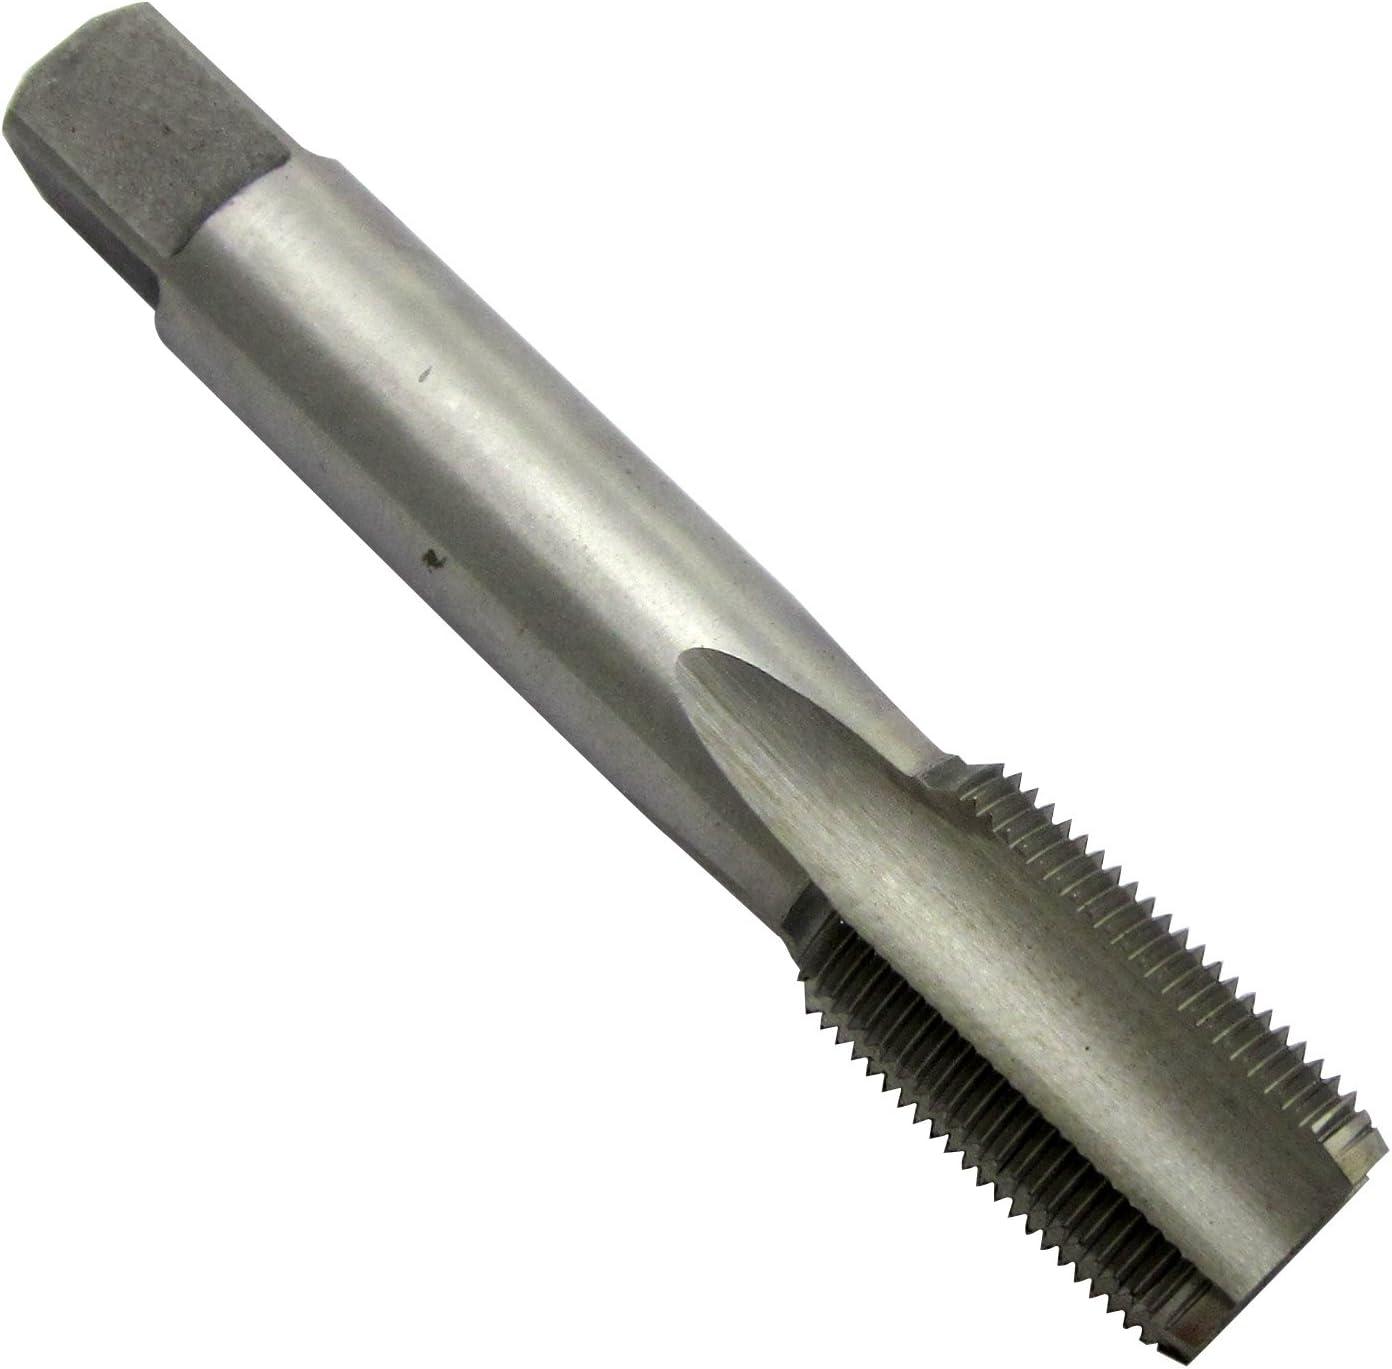 M22 x 1.0 HSS Metric Left Hand Thread Tap